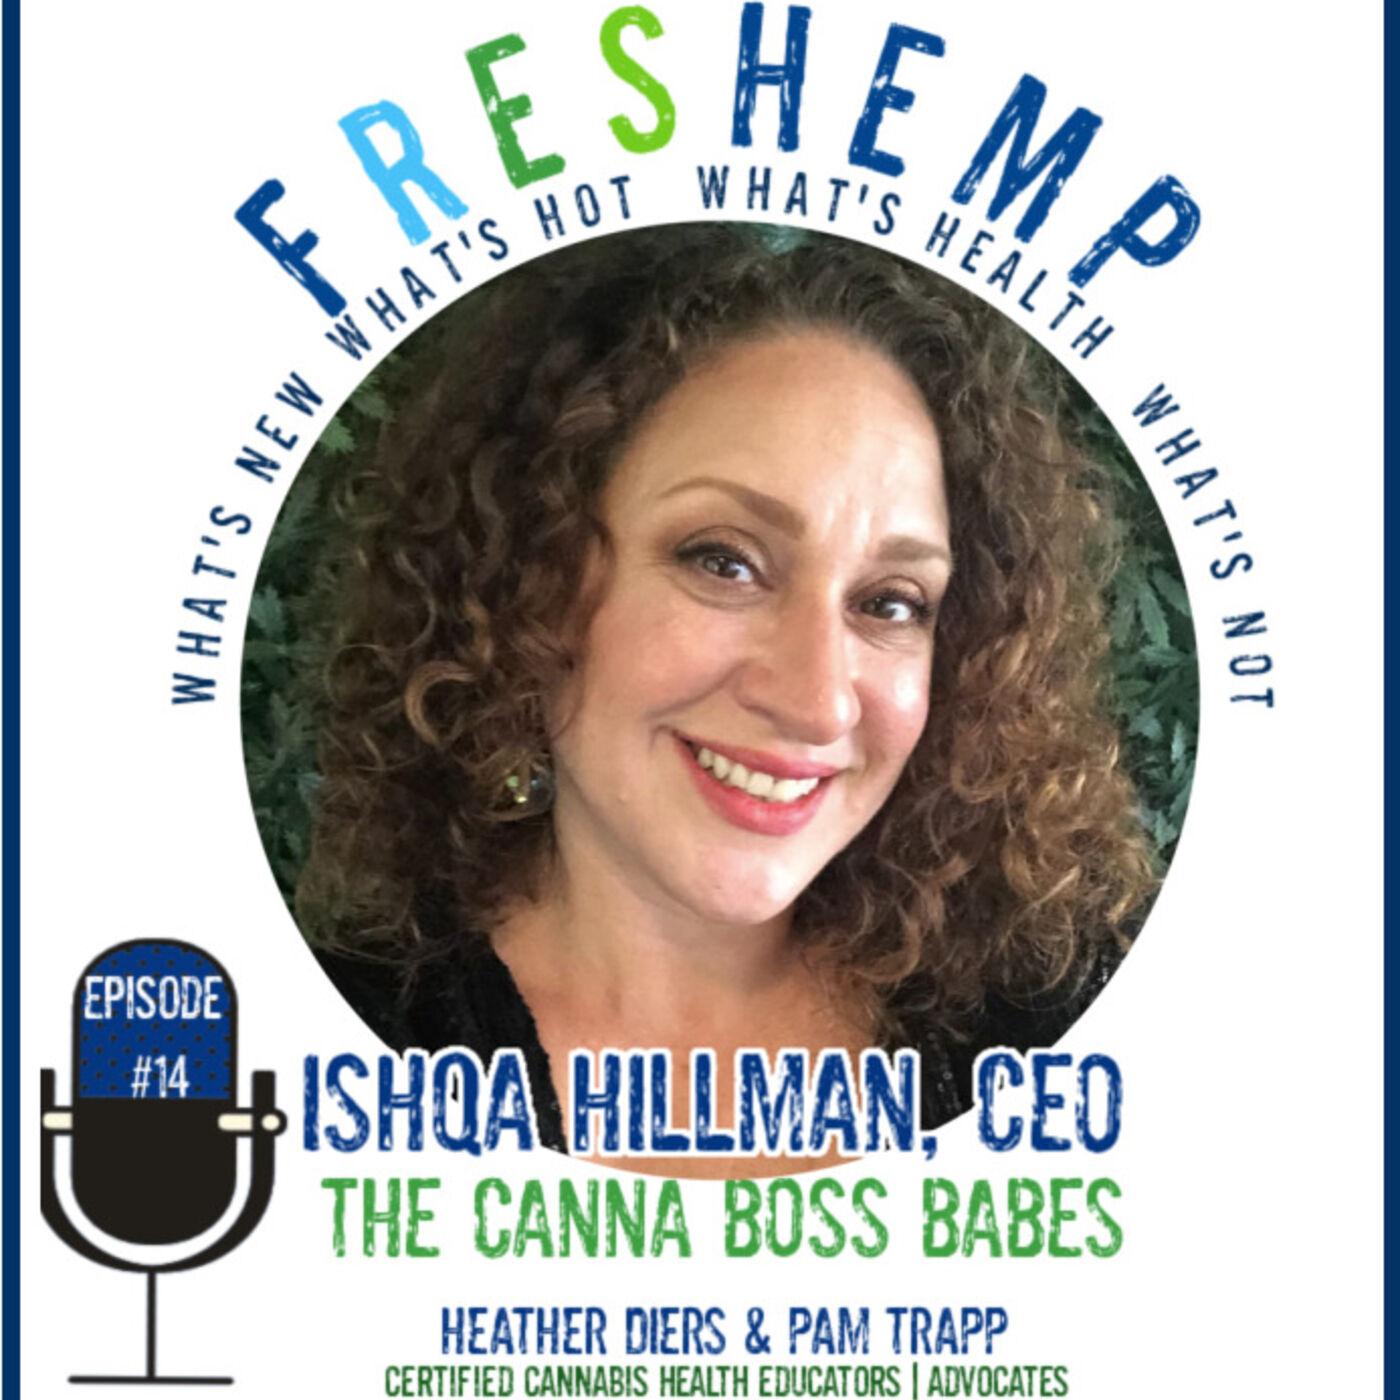 Ishqa Hillman - Canna Boss Babes | Managing Life's Speedbumps w Cannabis